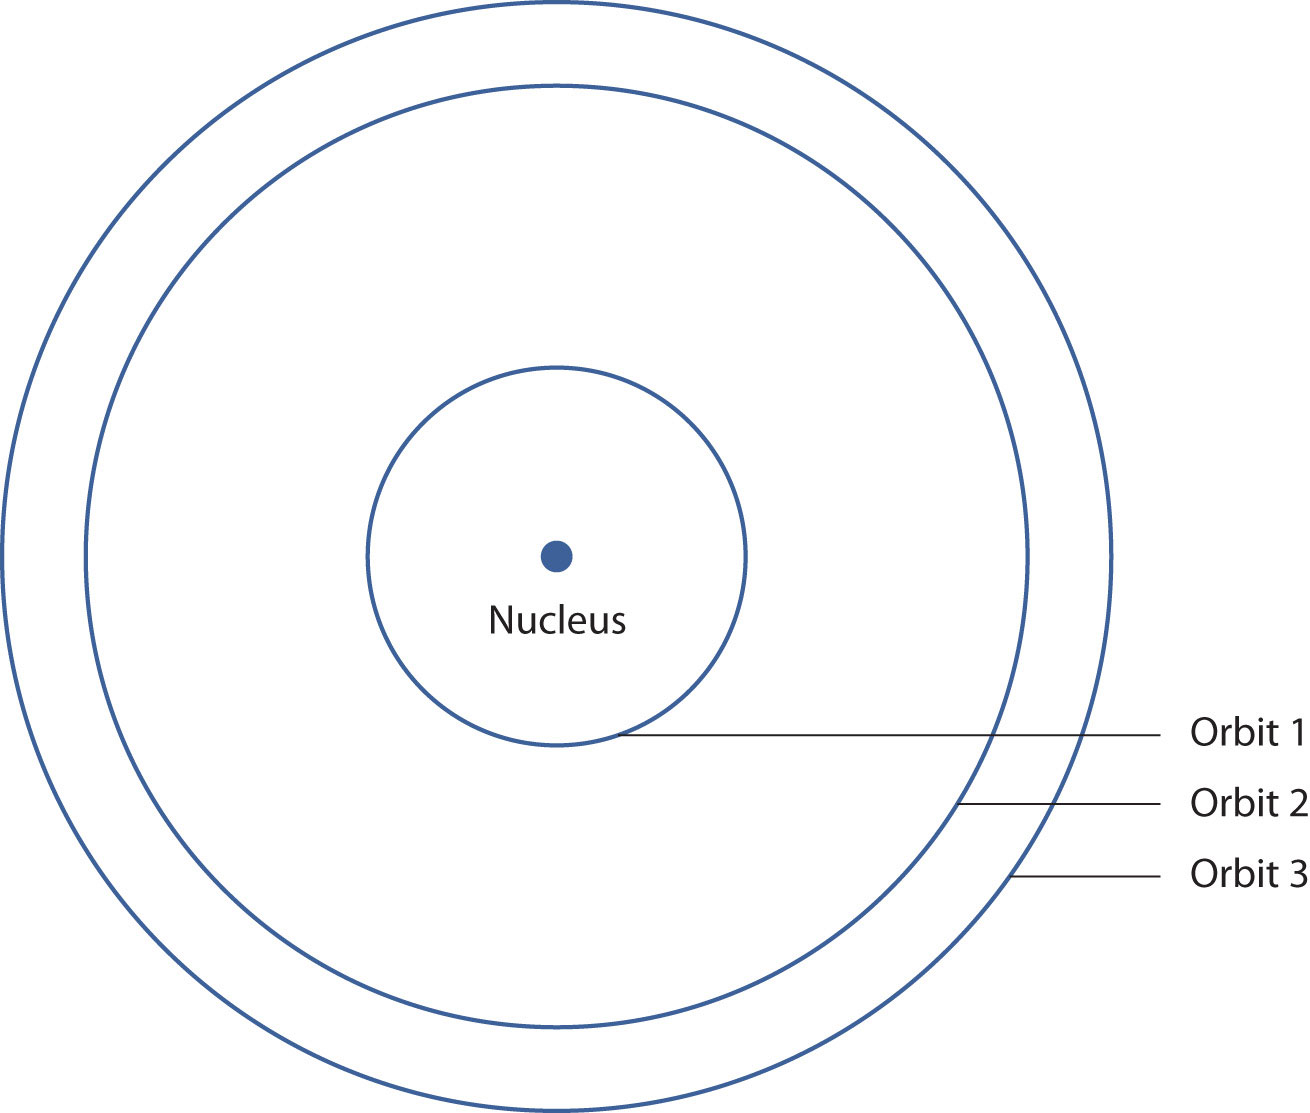 bohr model for hydrogen